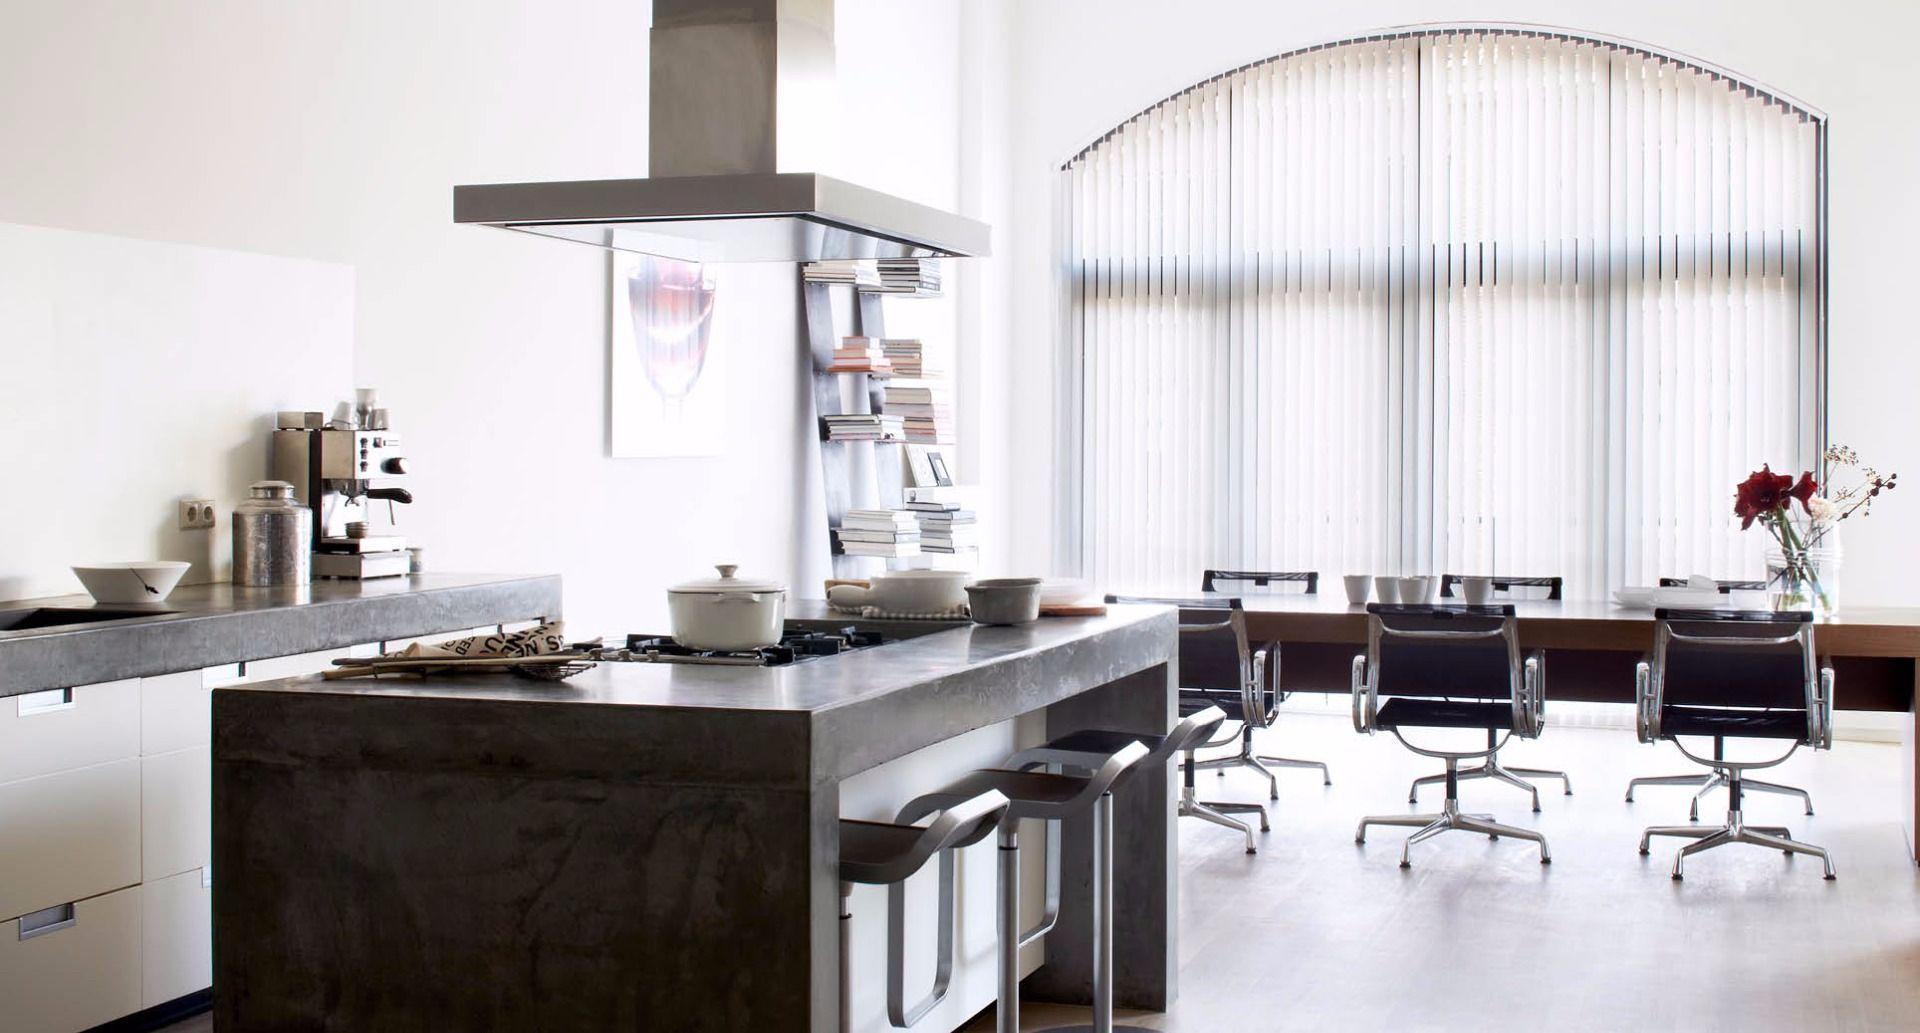 Raamdecoratie in de keuken invito in sint truiden